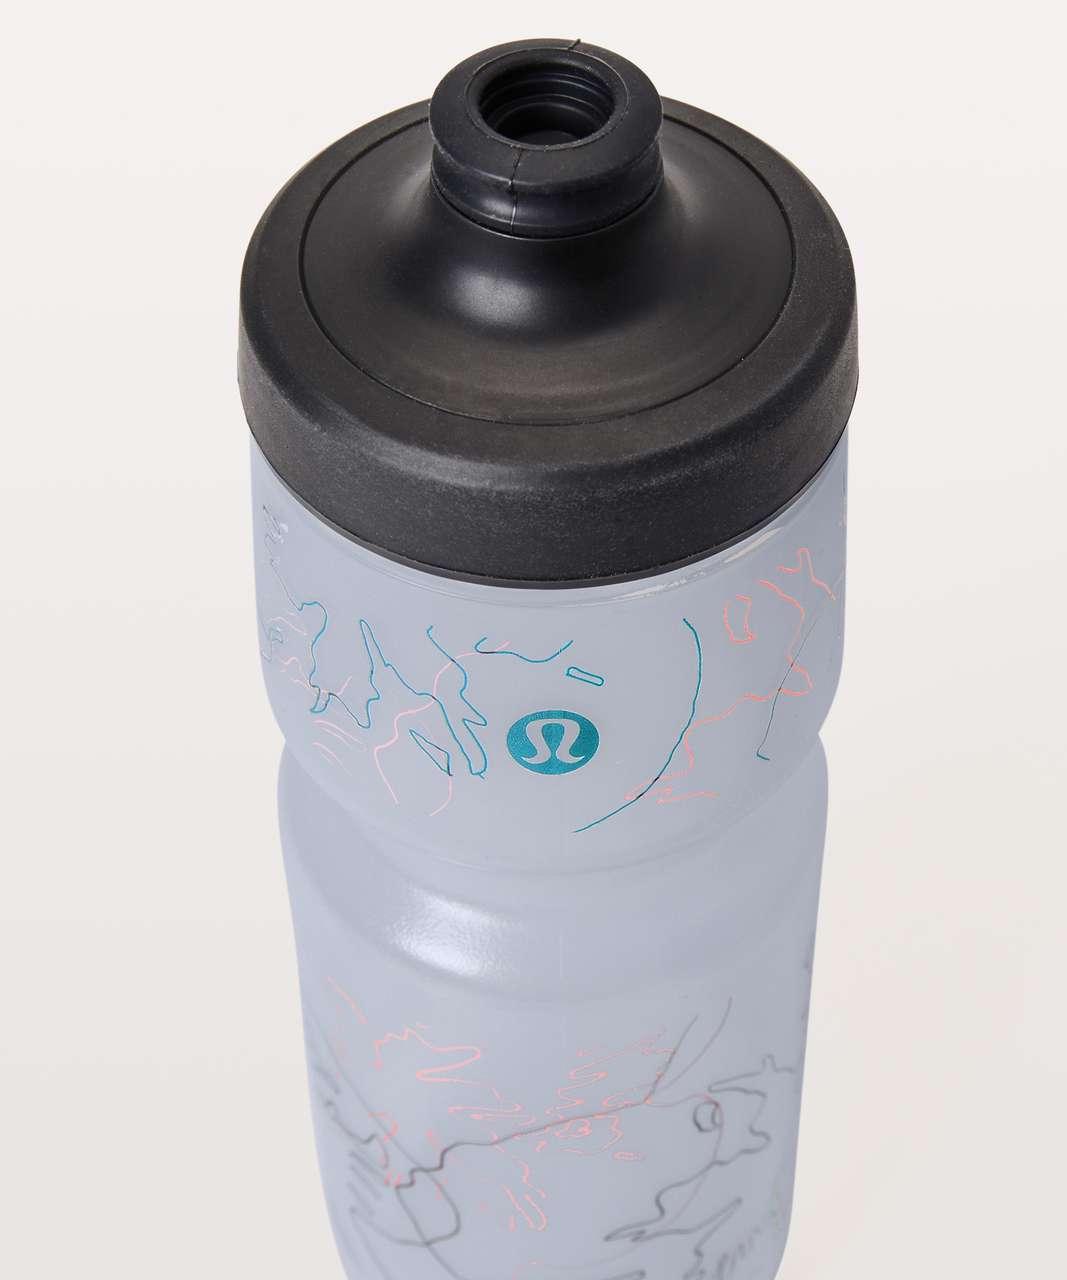 Lululemon Purist Cycling Water Bottle - Faint Floral